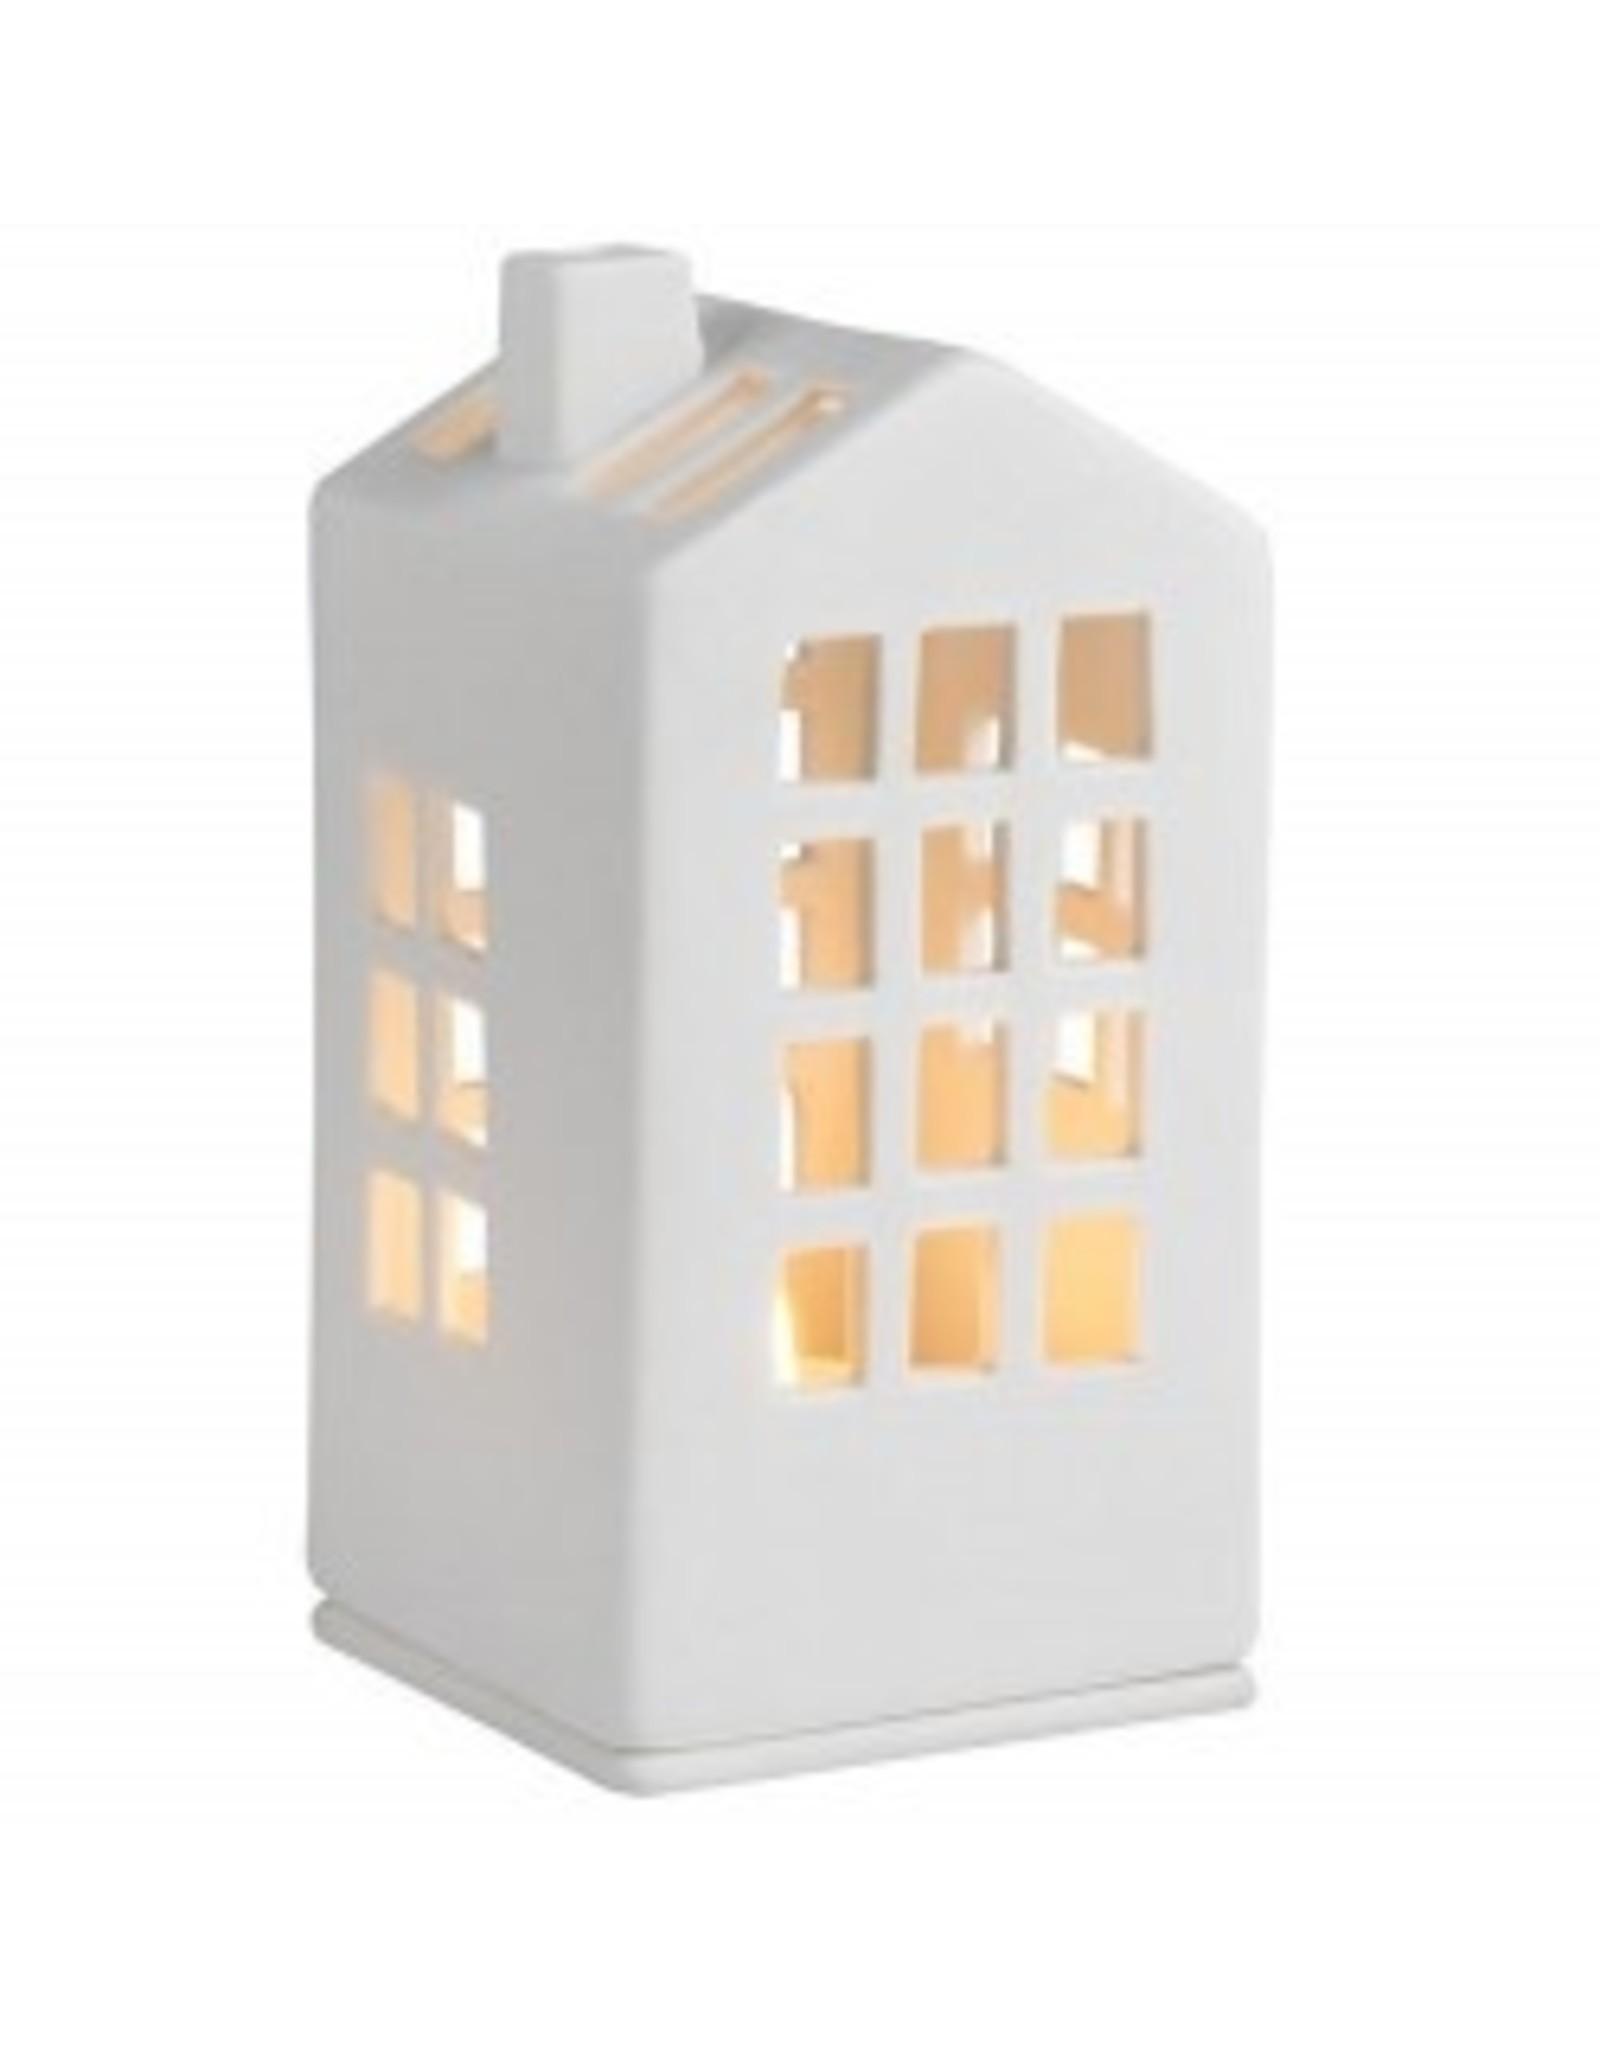 Raeder Mini lighthouse - Town Halle - 6 x6x12,5 cm